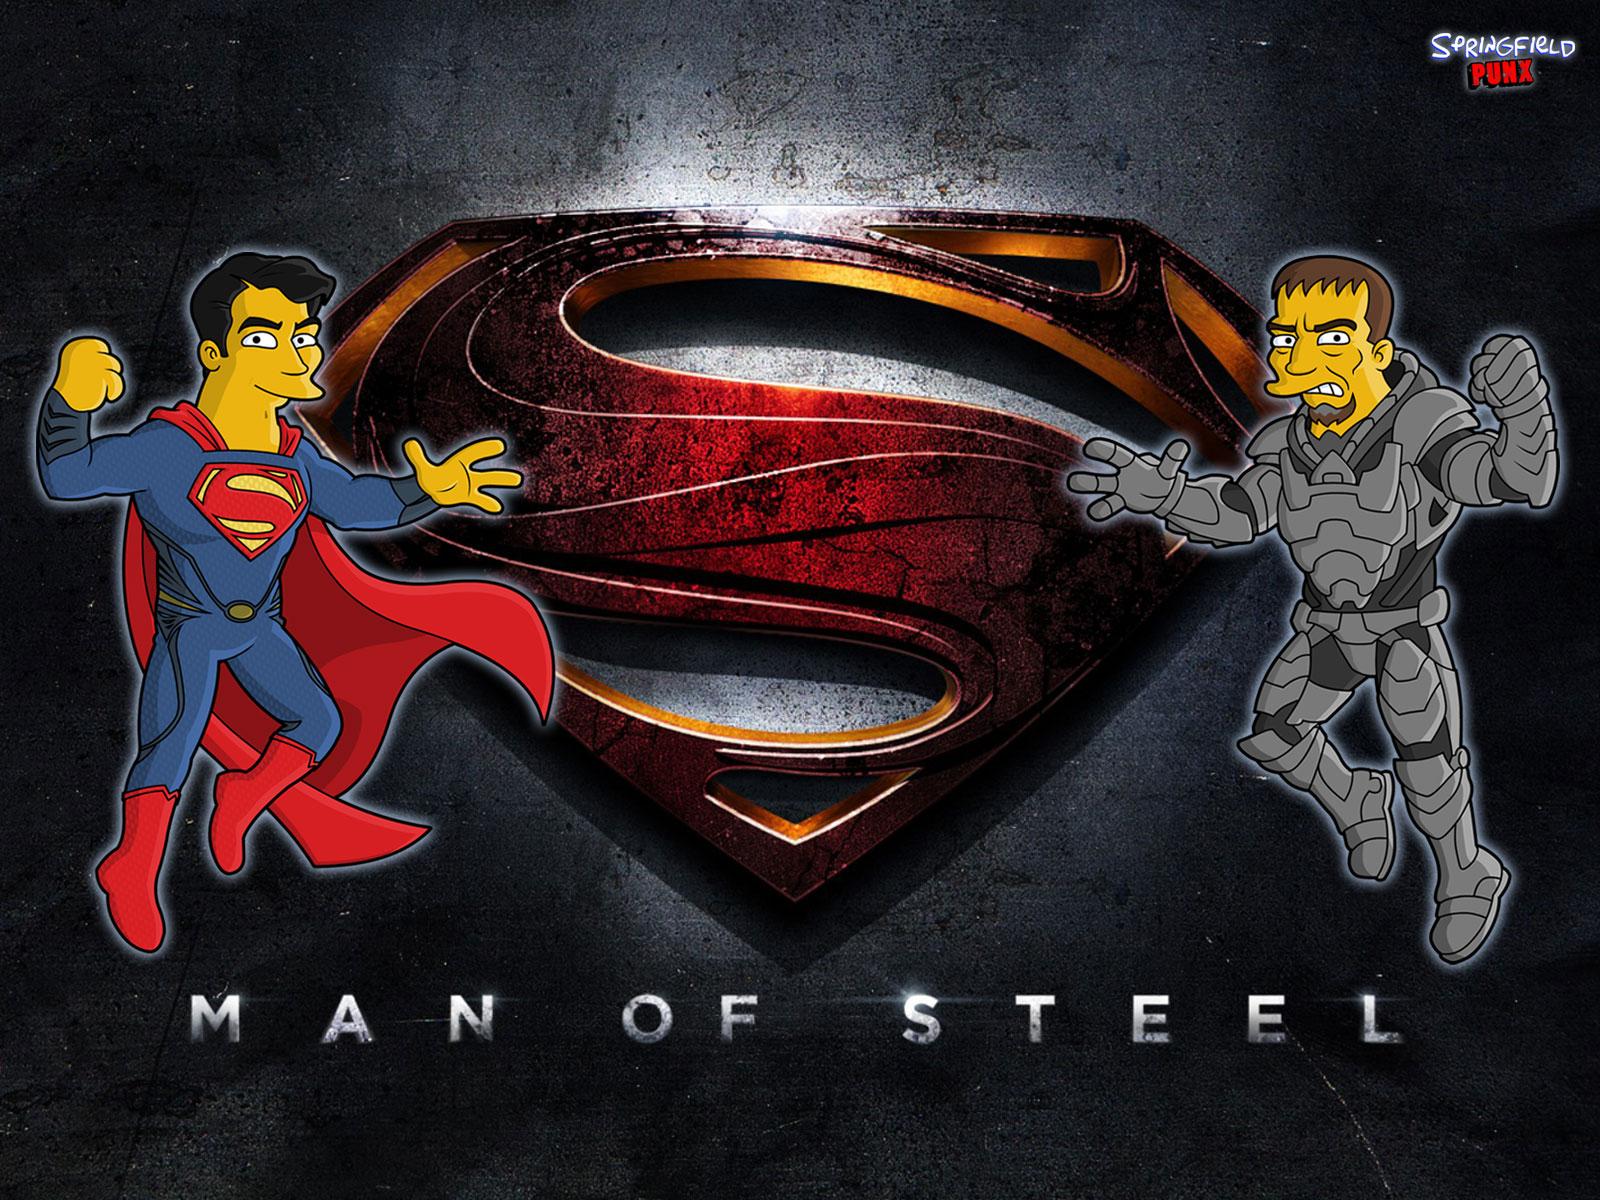 Springfield Punx Man of Steel Wallpaper 1600x1200